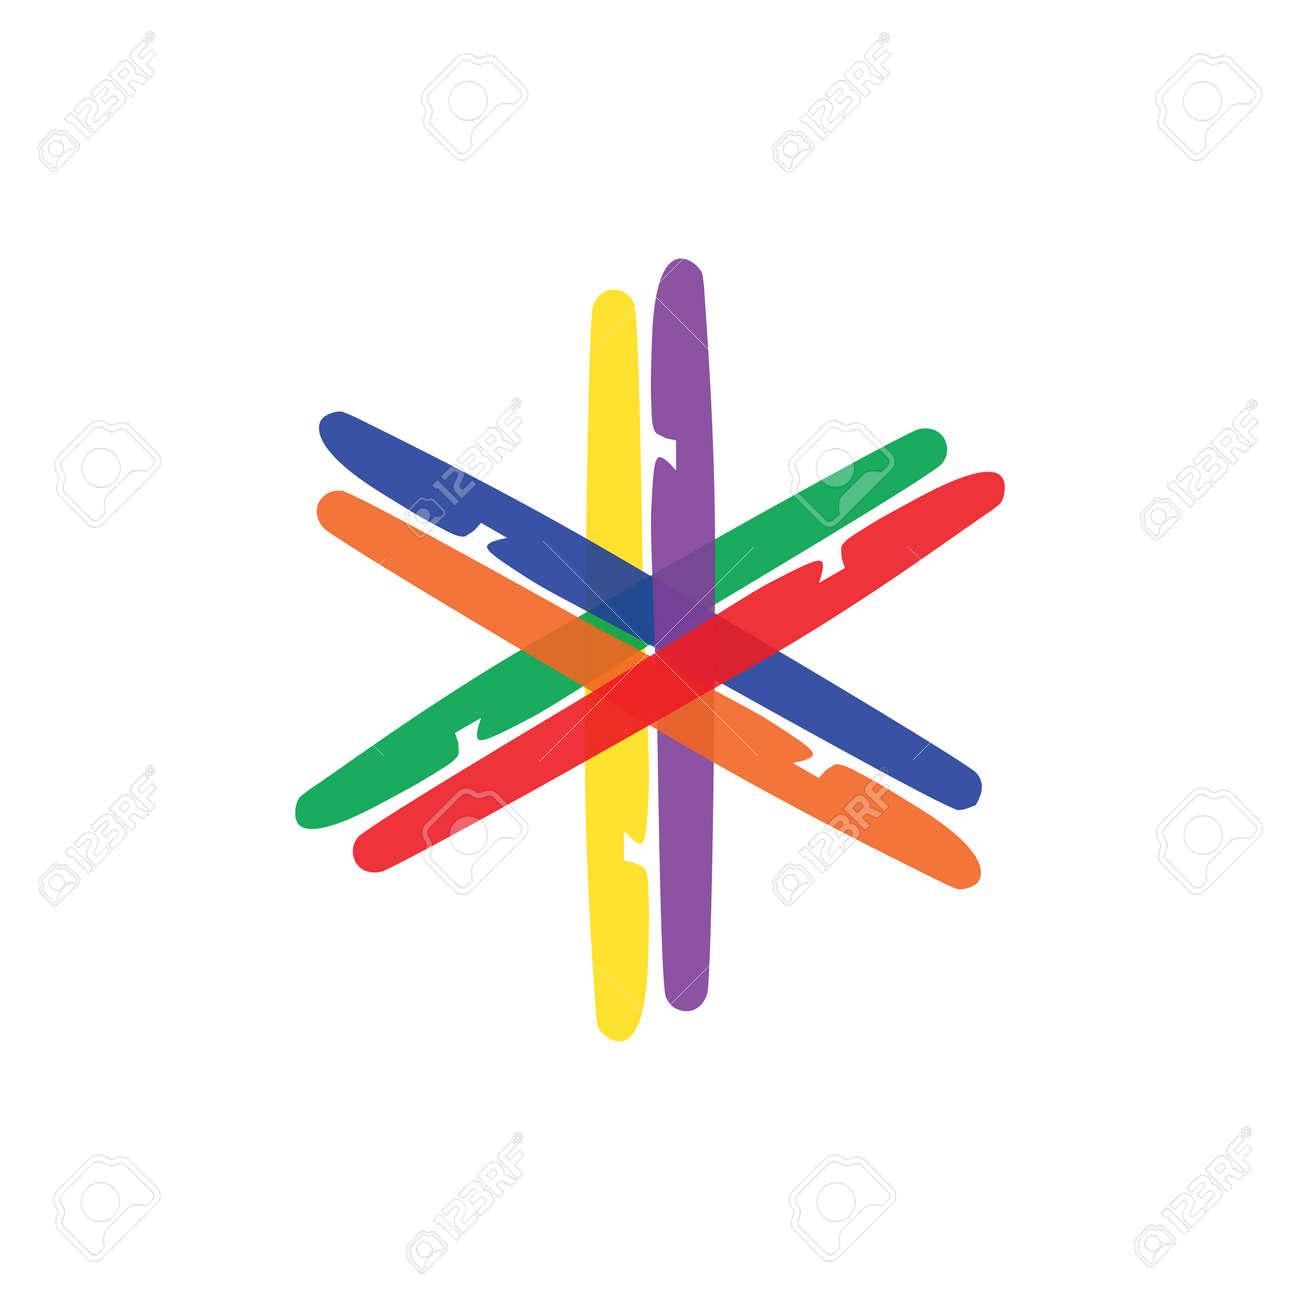 colorful hexagon logo web icon vector template. designed like a rainbow to show unity, creativity, integrity, community, plural, trust, balance, variation, etc. - 144476315